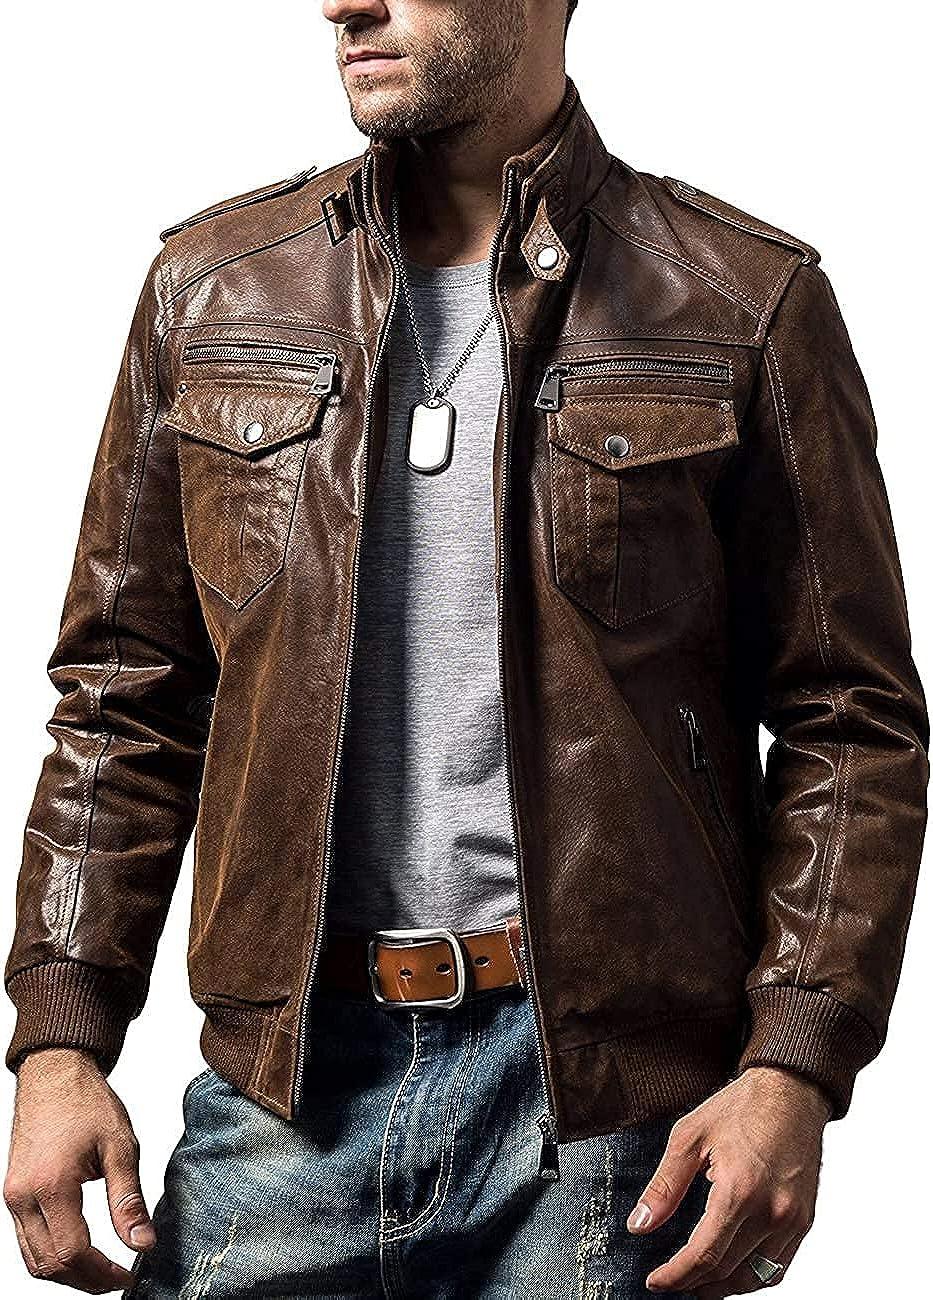 Mens Brown Leather Jacket Vintage Slim Fit Biker Retro Genuine jacket coat